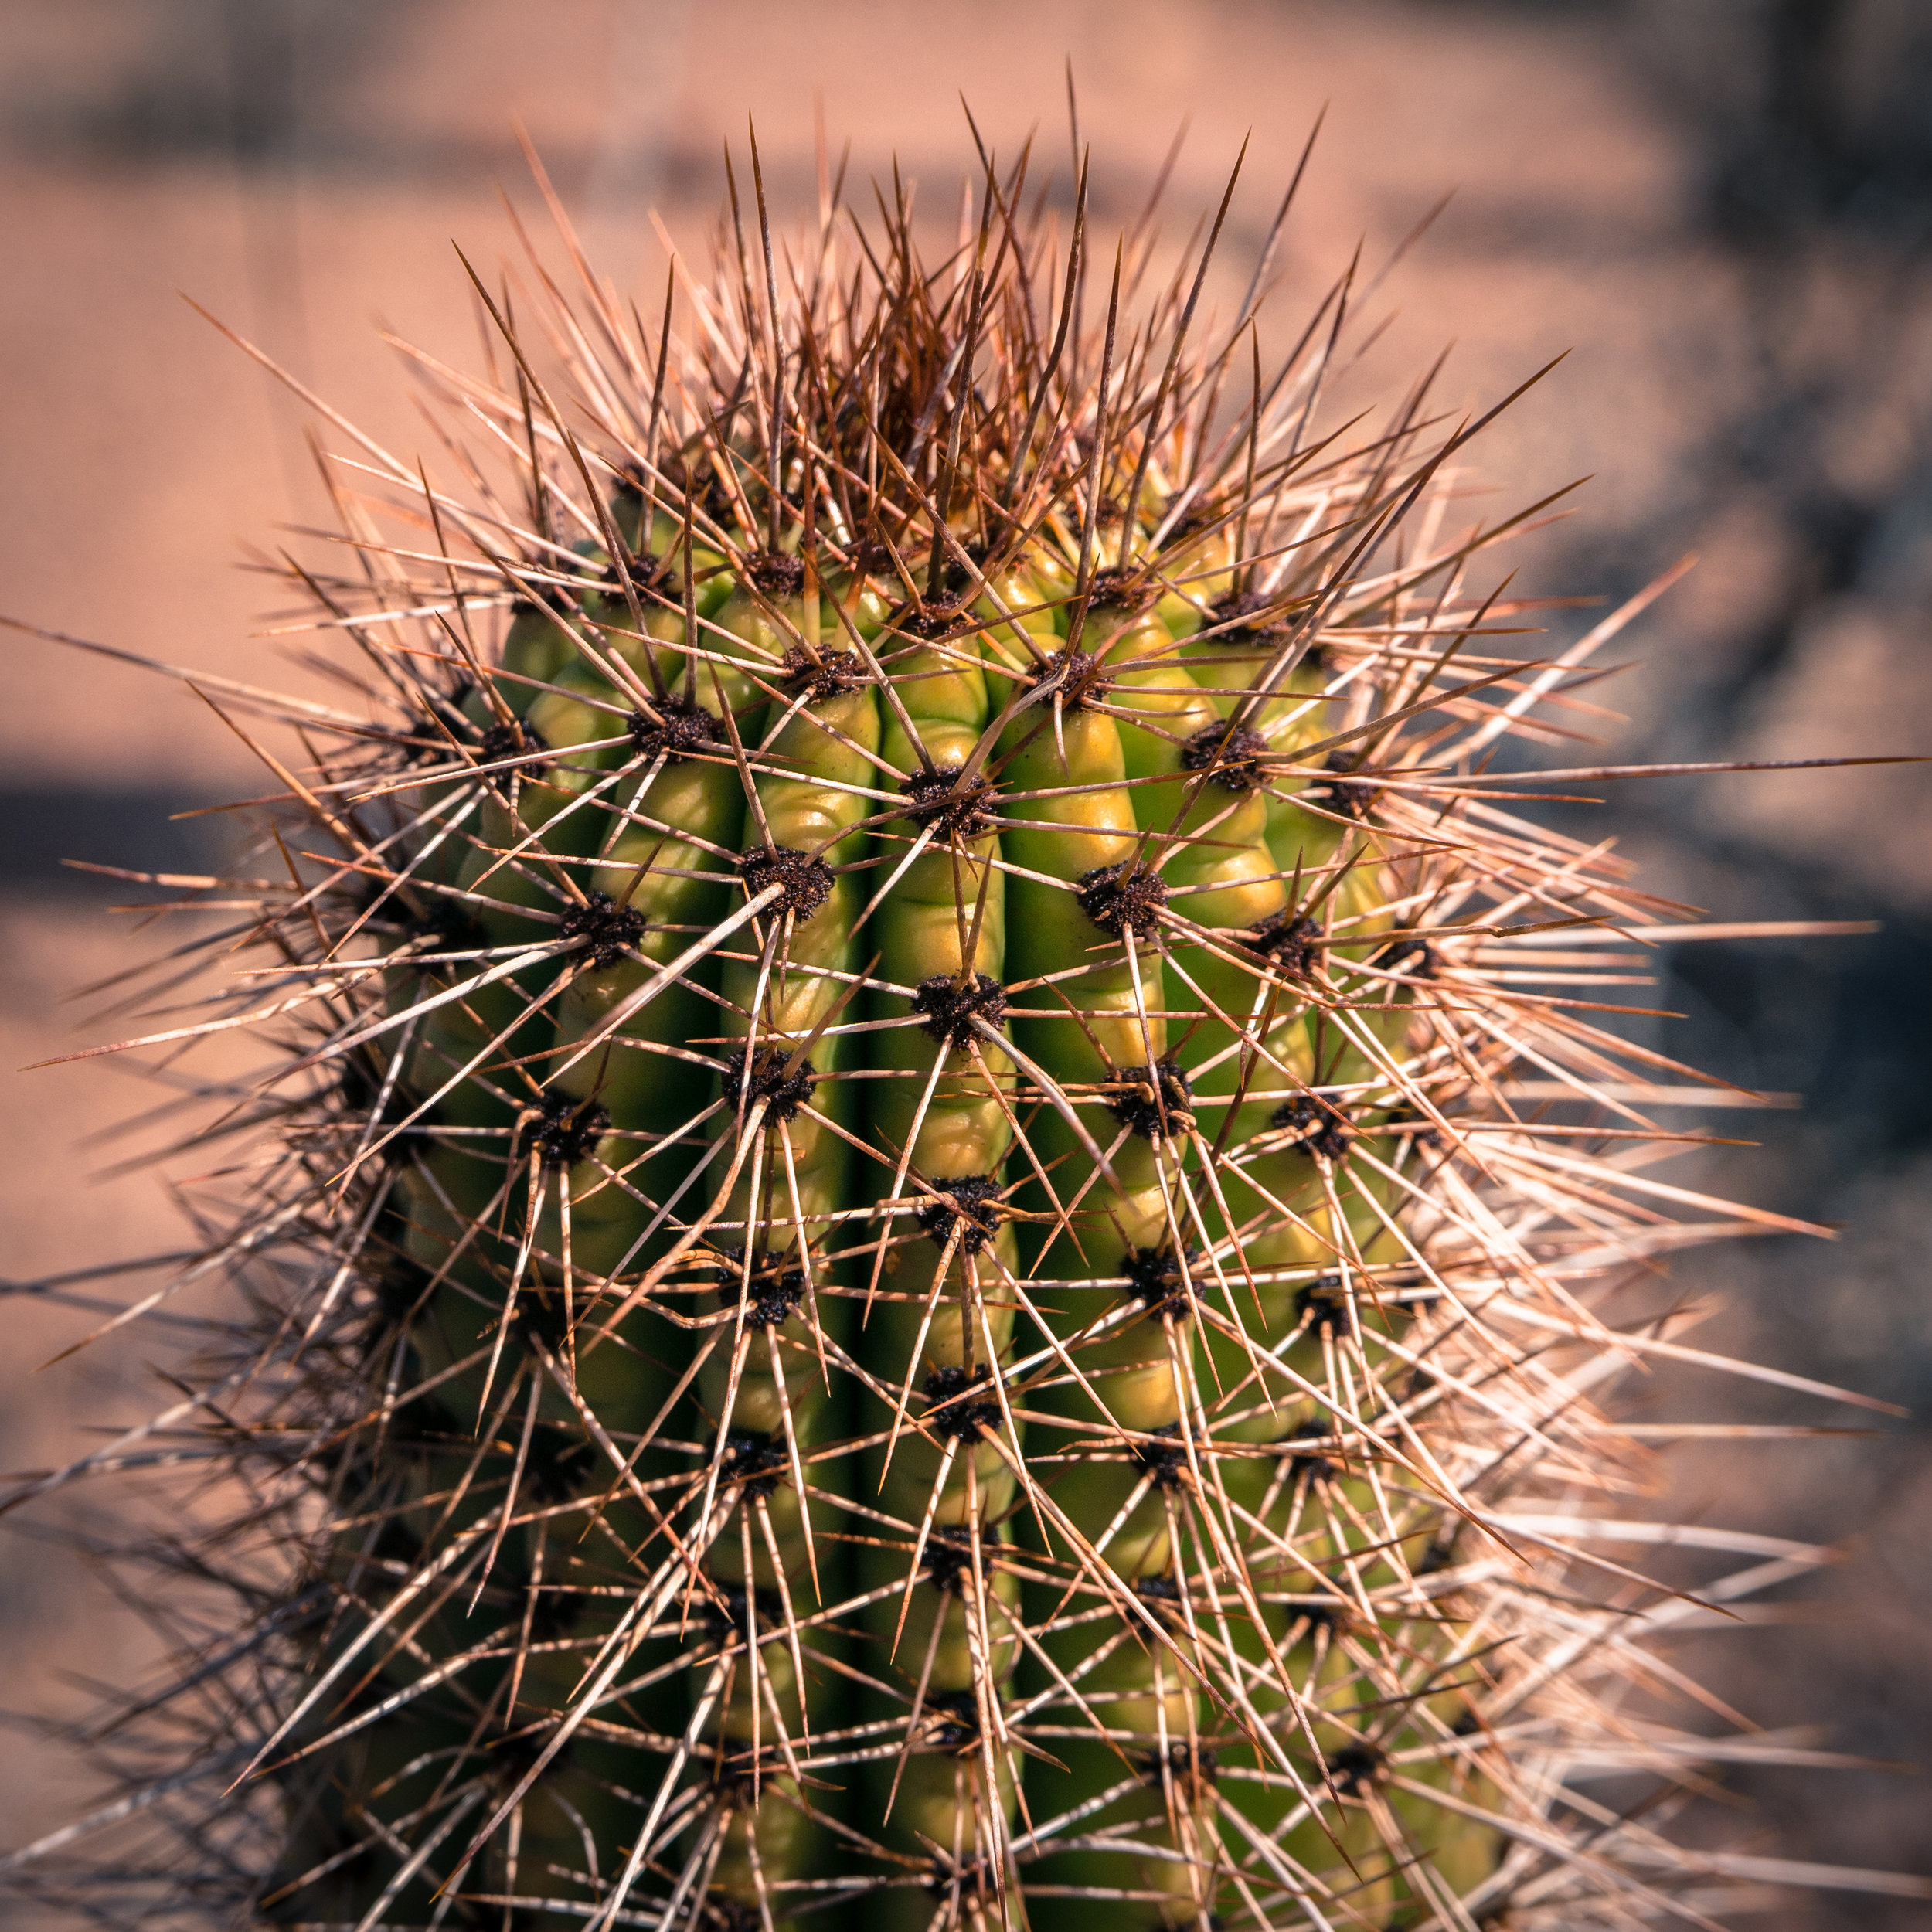 Organ Pipe Cactus, up close and personal.